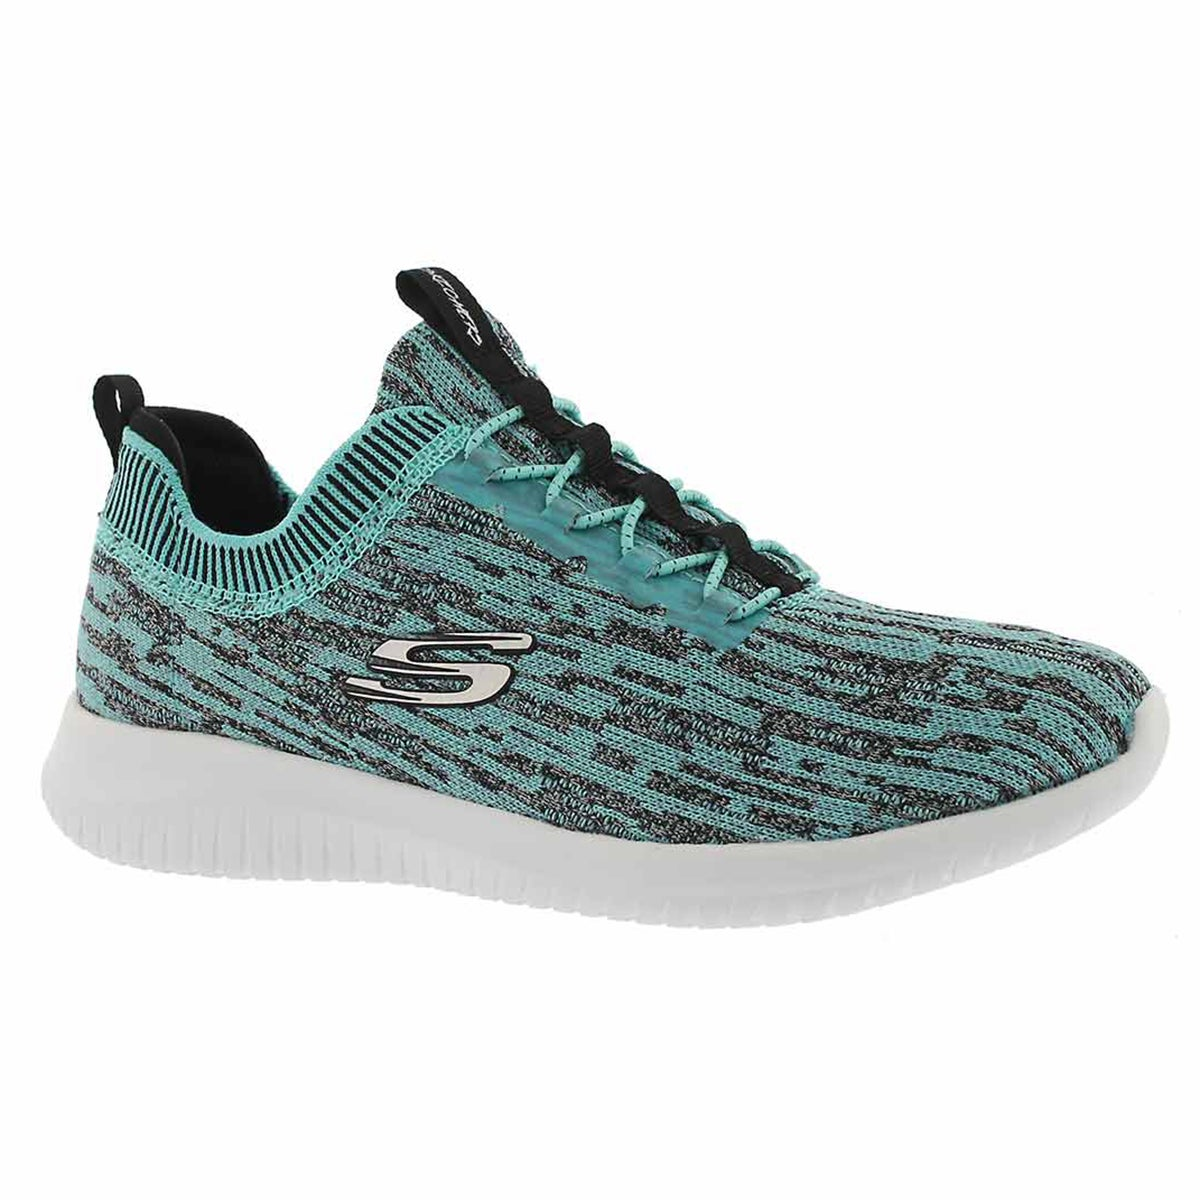 Women's ULTRA FLEX BRIGHT HORIZON tq/blk sneakers